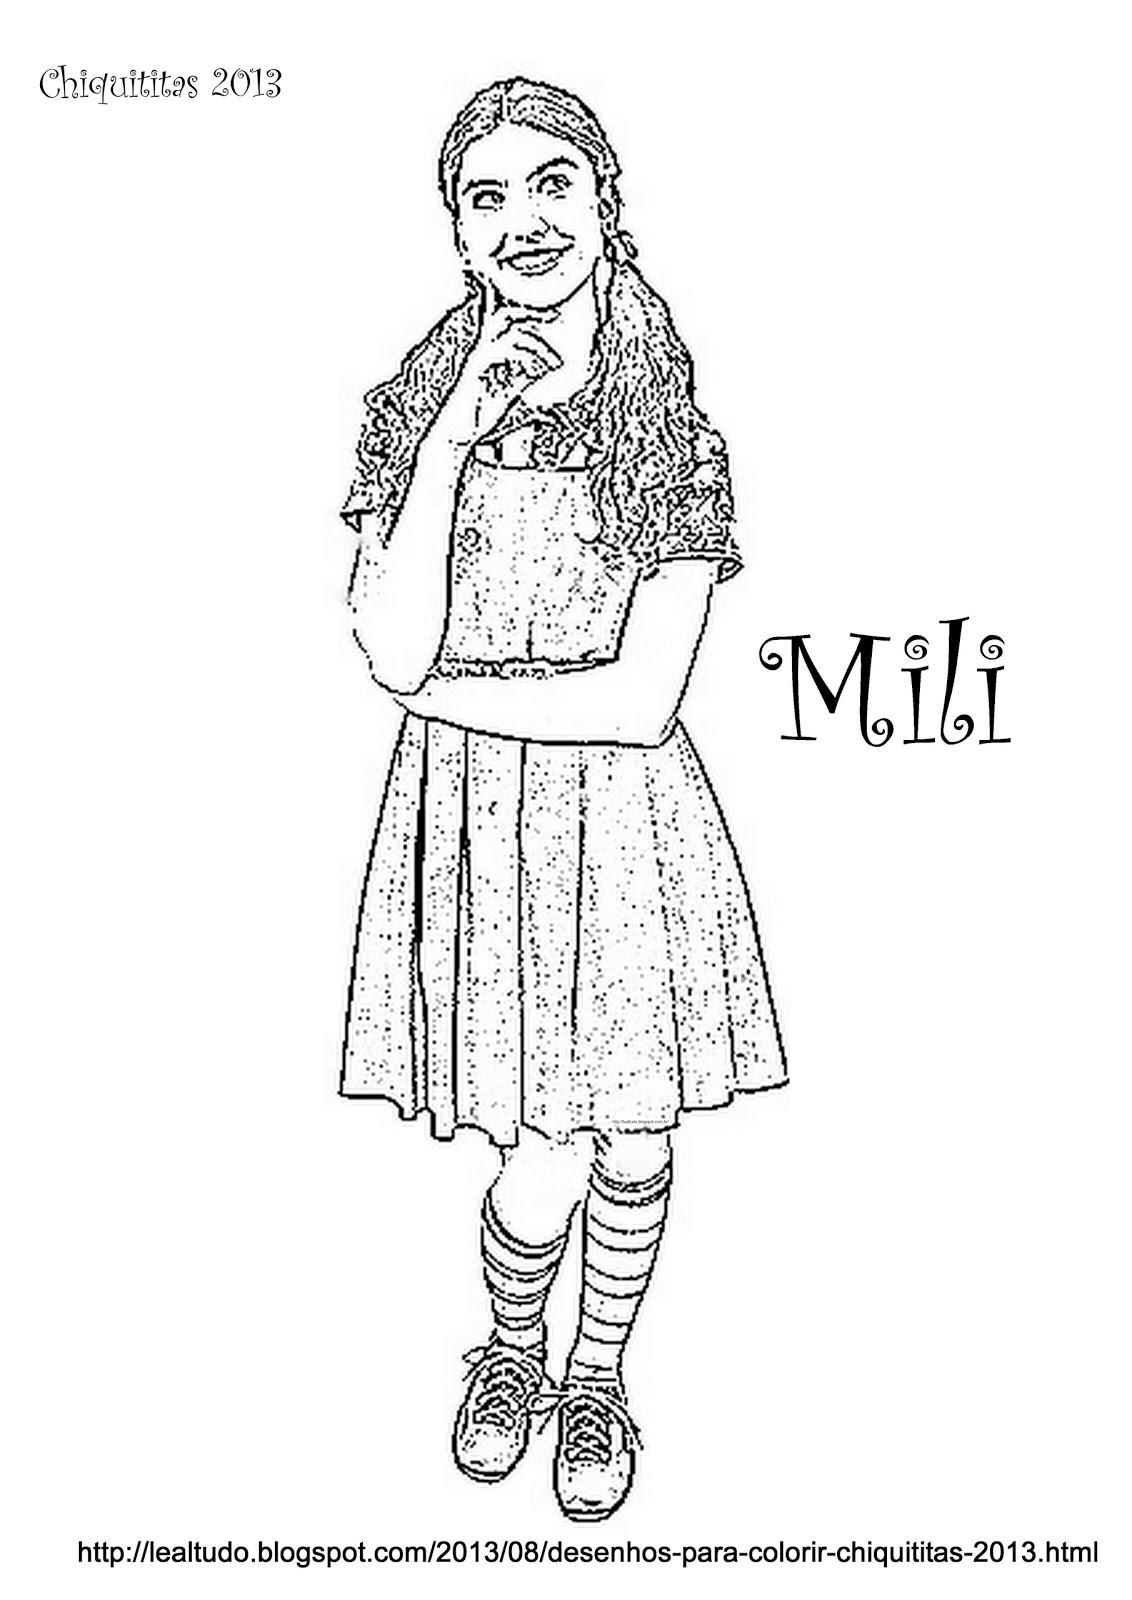 desenhos de chiquititas para colorir novela sbt 2013 mili pata bia